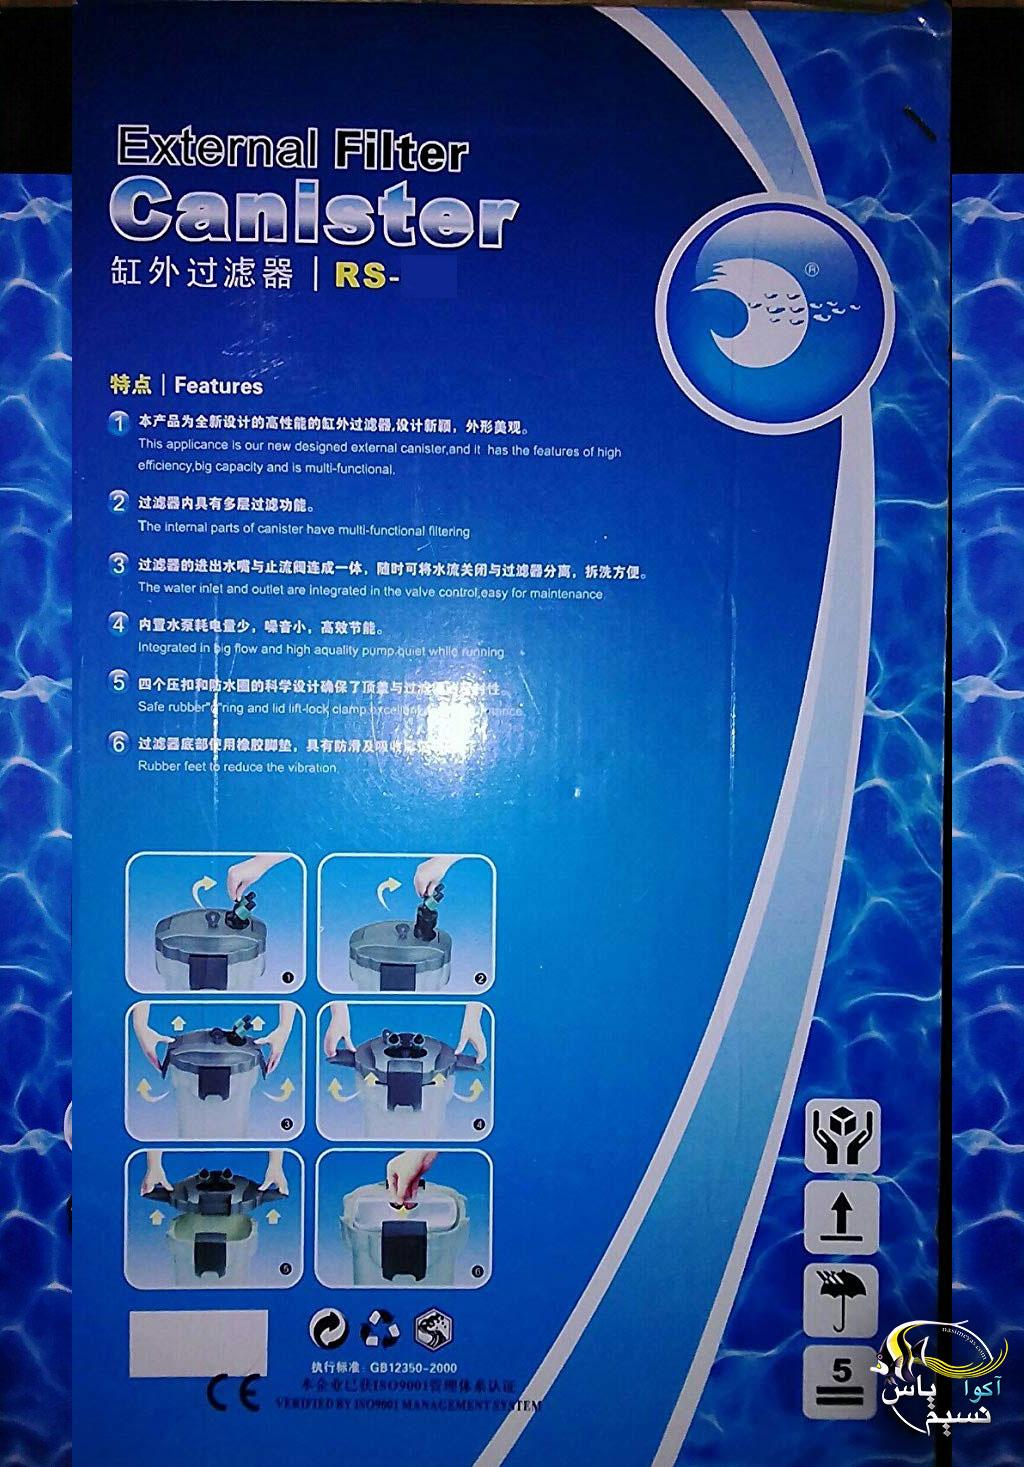 فیلتر سطلی RS-65 الکتریکال